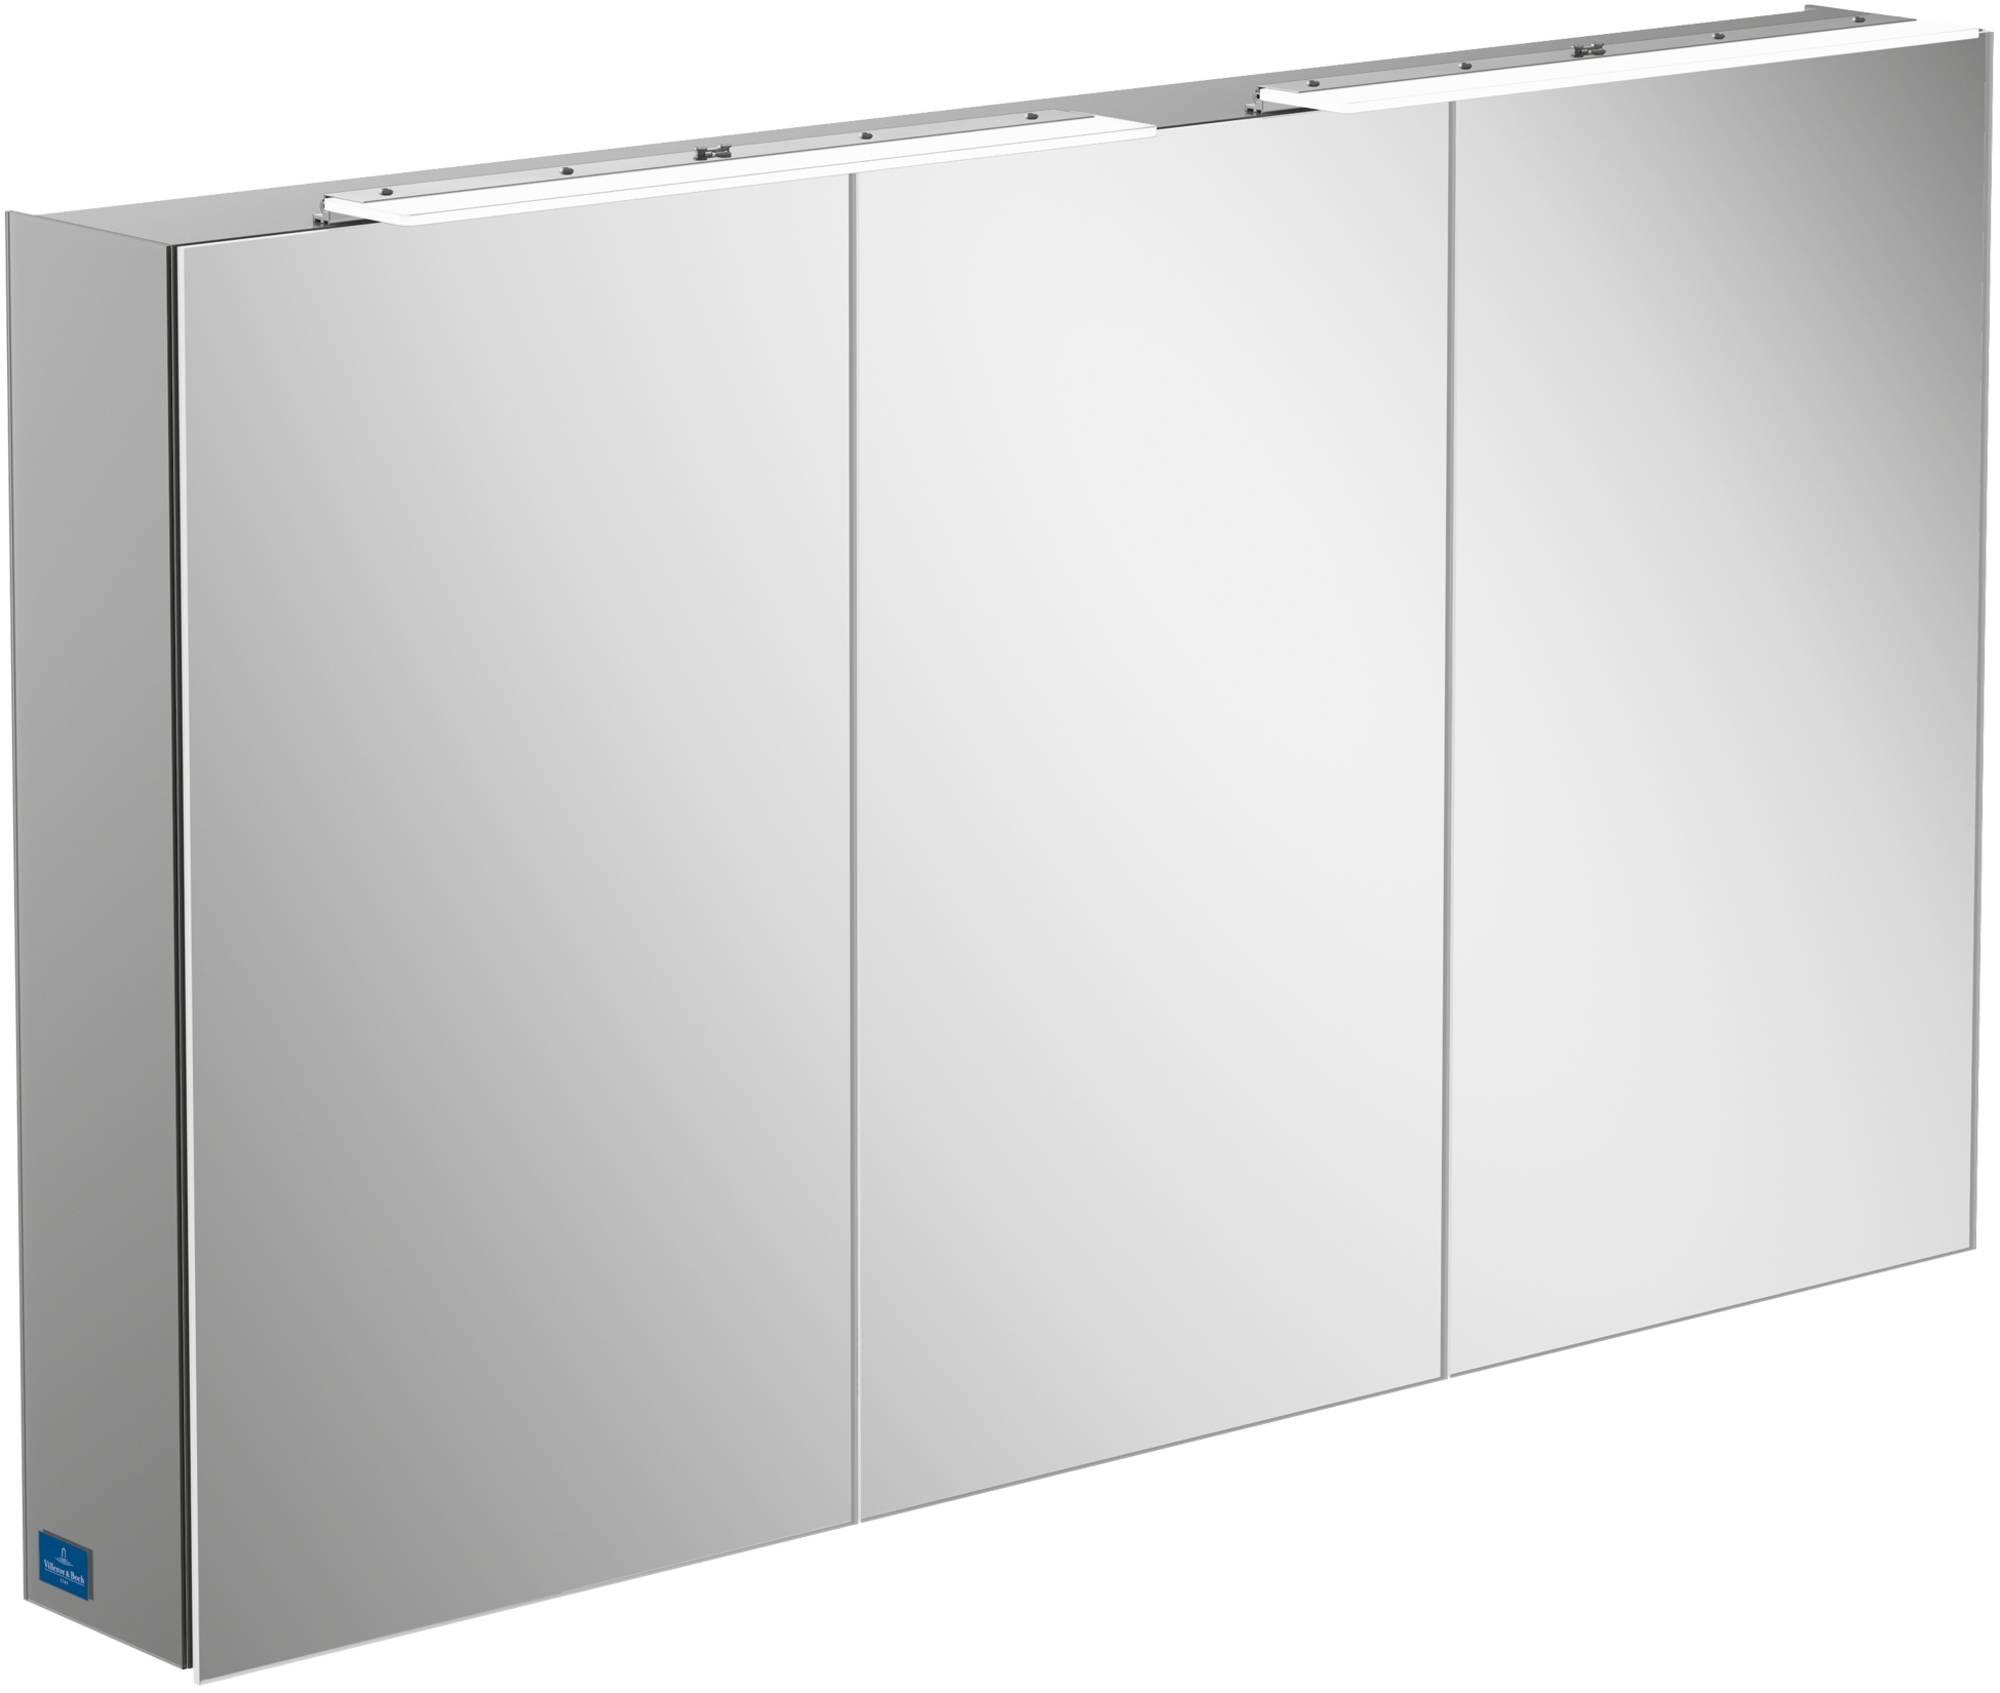 Villeroy & Boch My View One Spiegelkast 130x17,3x75 cm Aluminium-Look